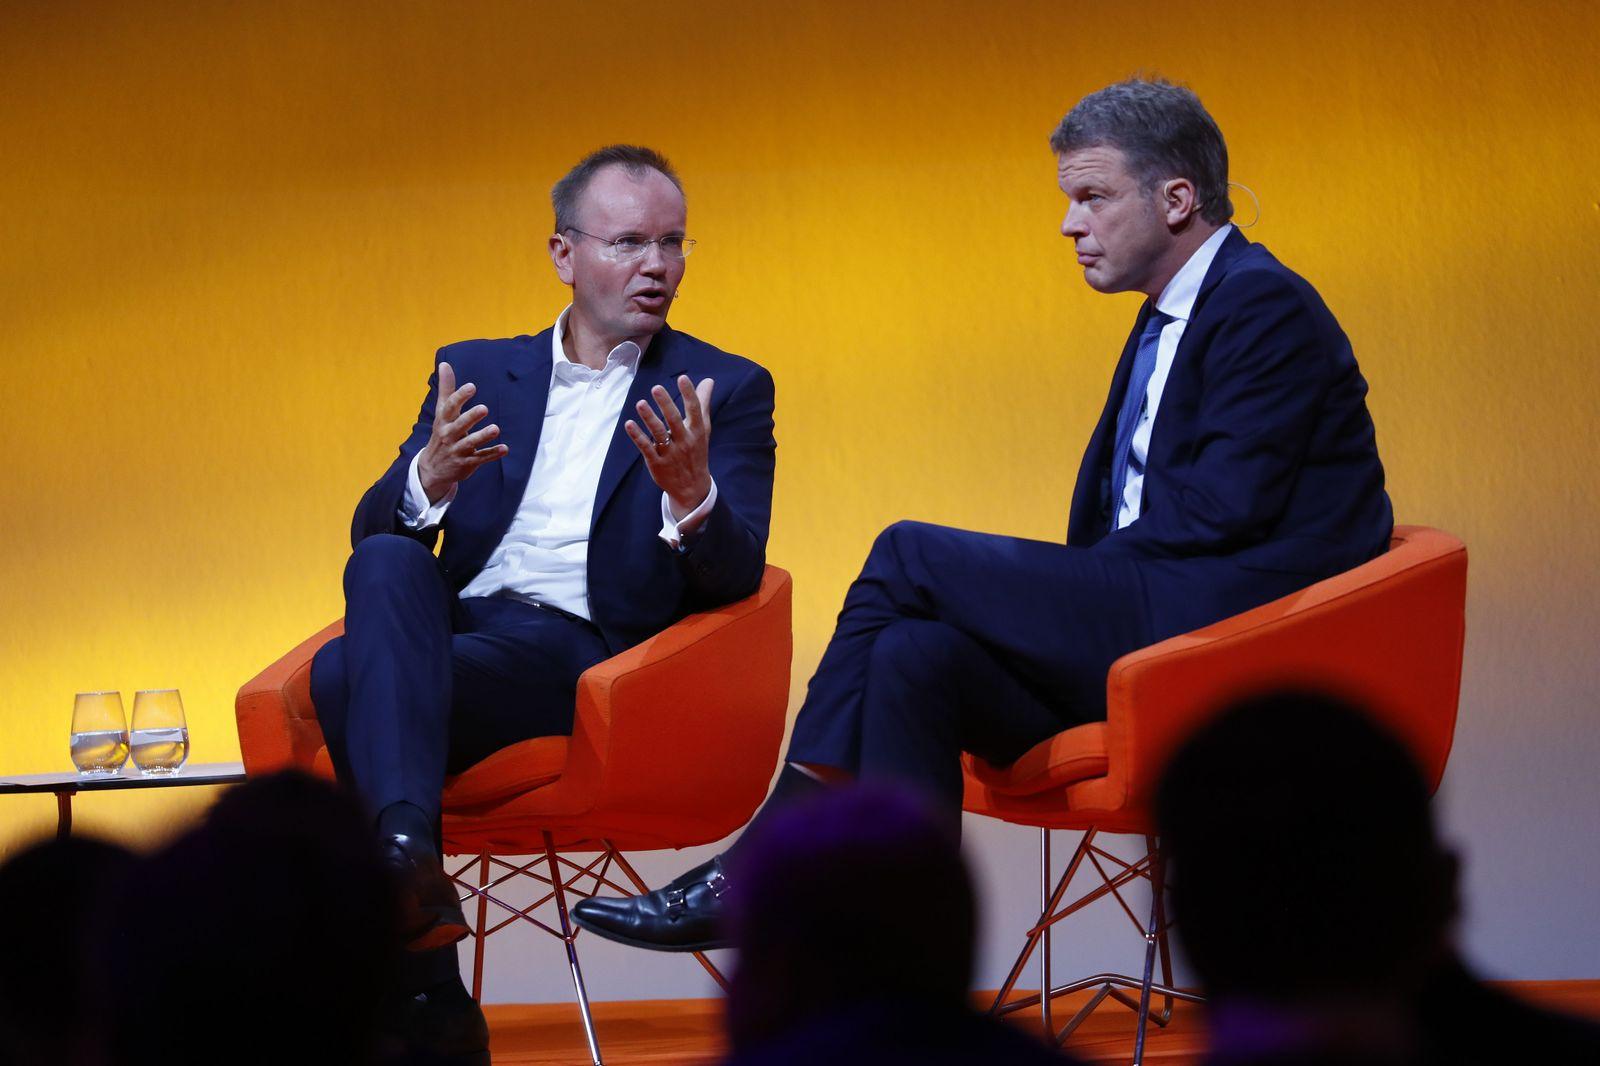 Key Speakers at the Handelsblatt Banking Summit